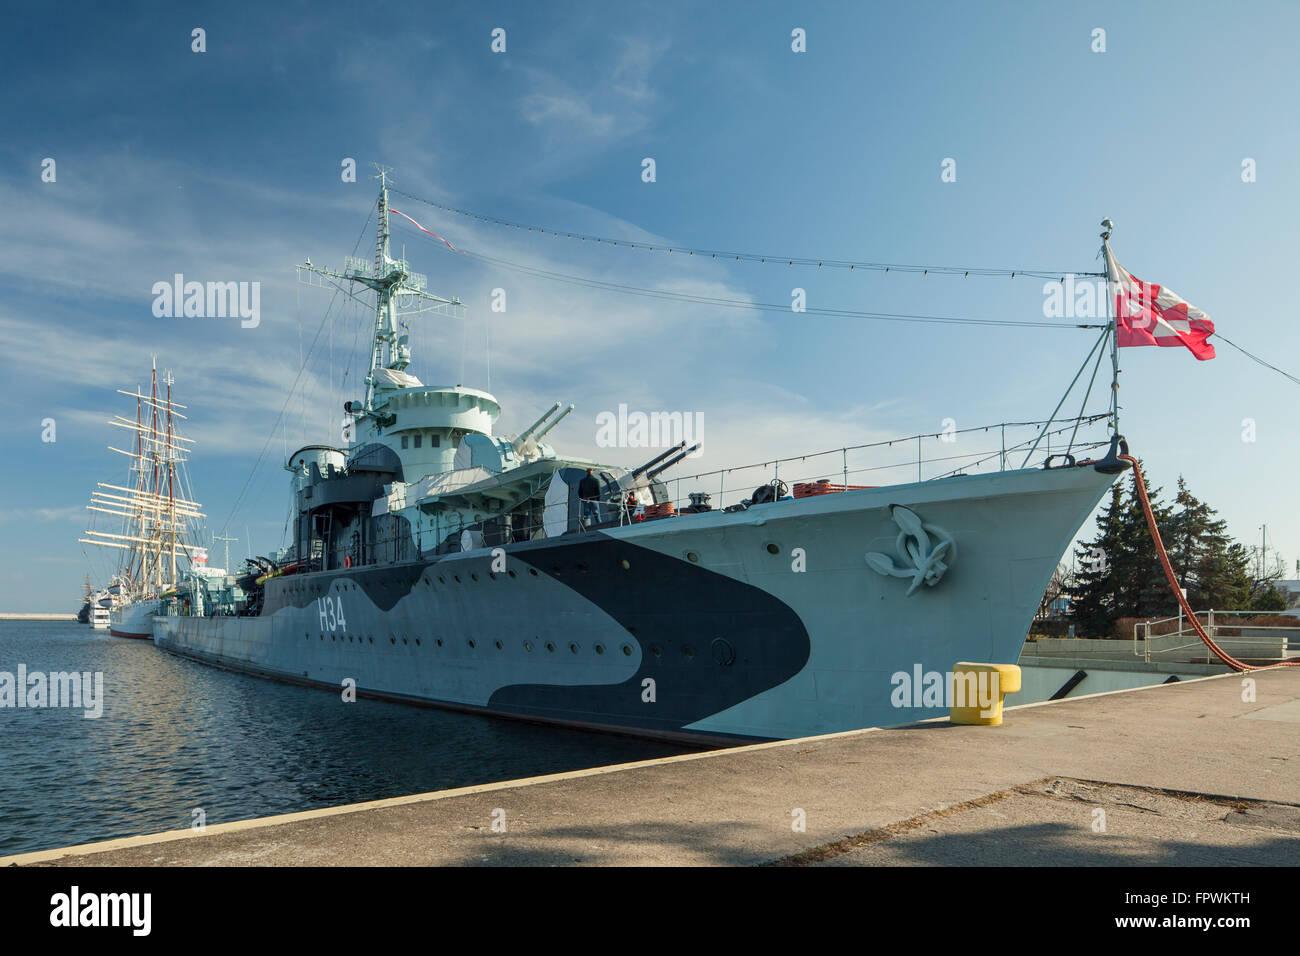 Historic warship 'Blyskawica' in Gdynia, Poland. - Stock Image